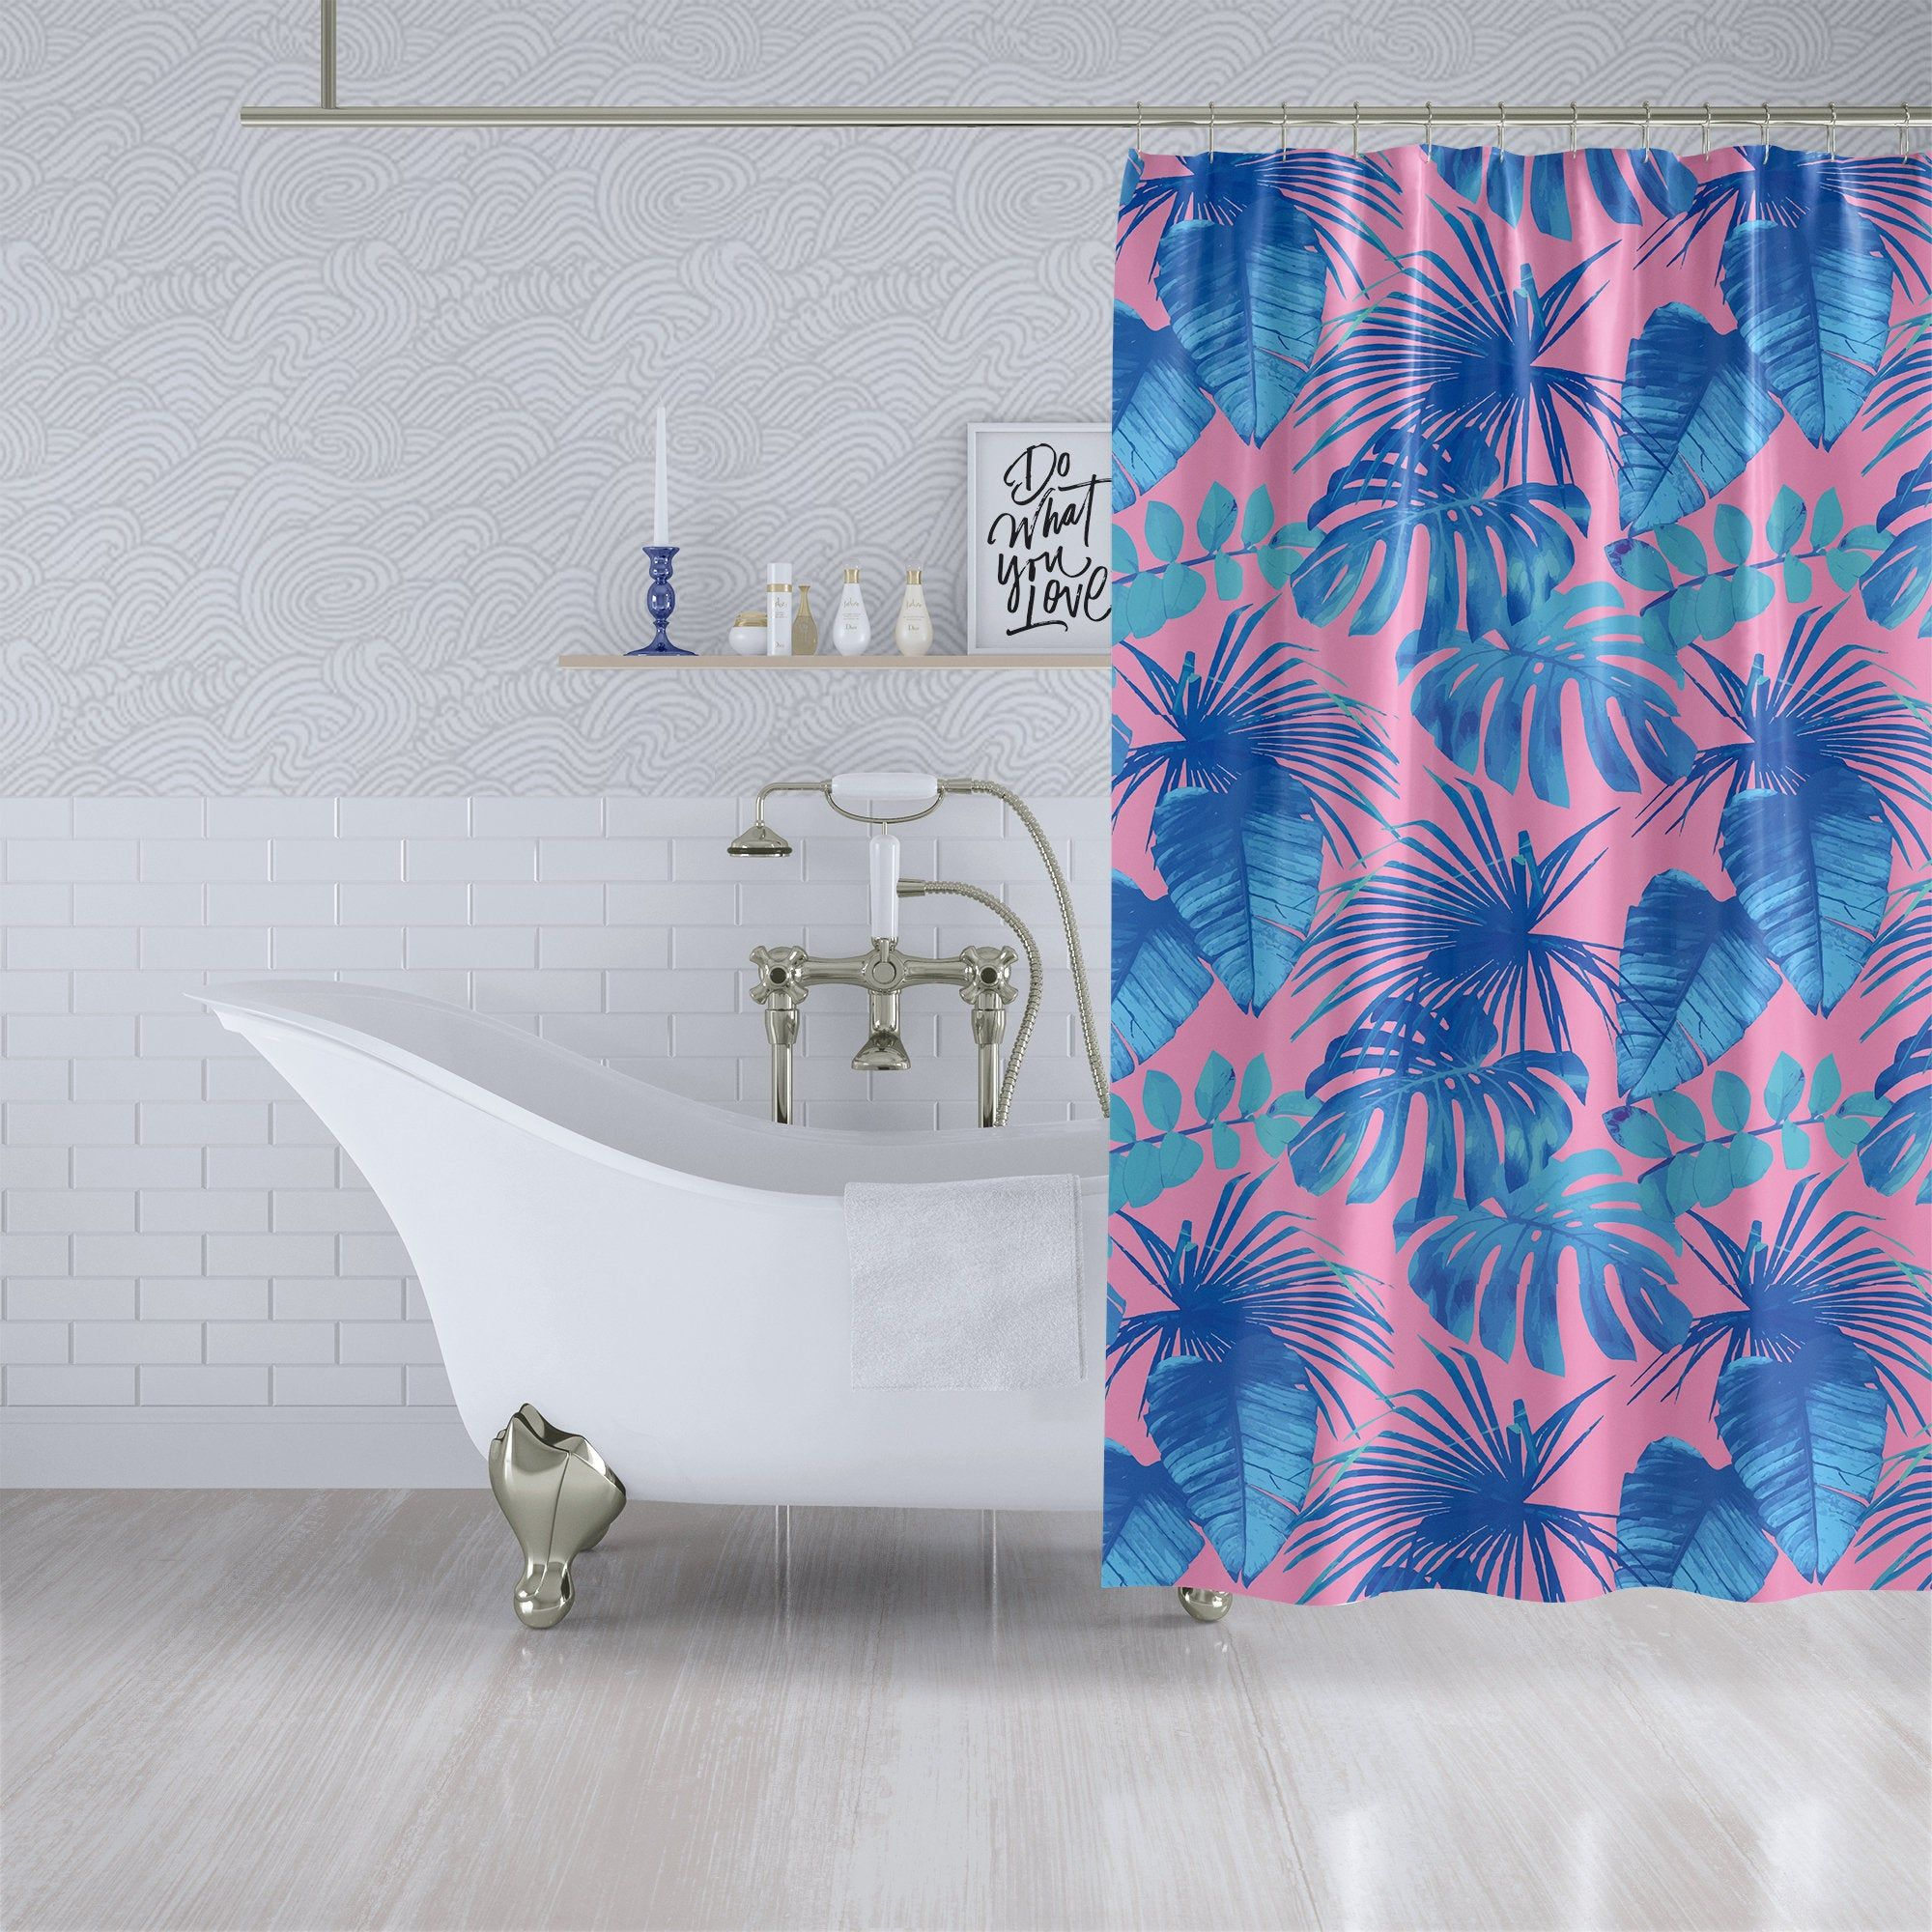 Pink Blue Tropical Leaf Fabric Shower Curtain Extra Long Bath Curtain 90x70 83x70 70x70 Custom Lengths In 2020 Pink Shower Curtains Fabric Shower Curtains Long Shower Curtains